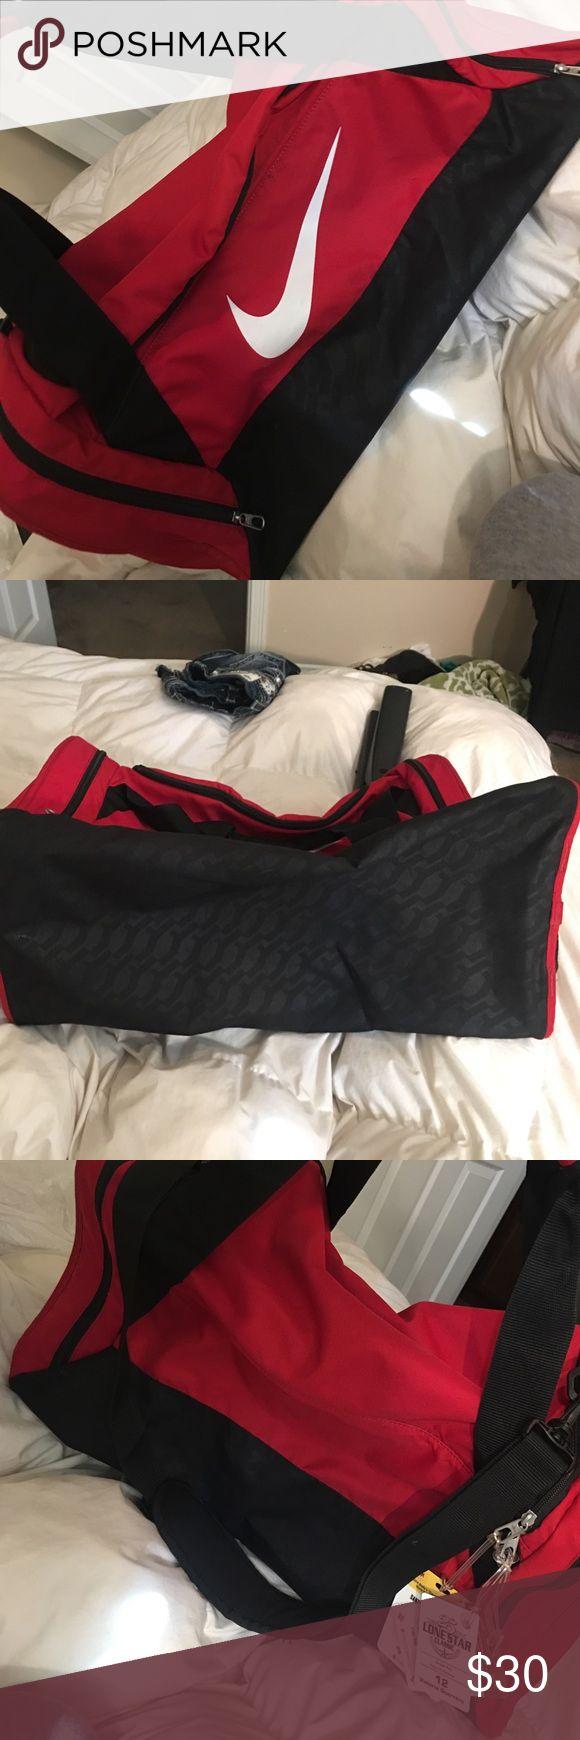 Nike sports bag Lightly used Nike bag Bags Travel Bags